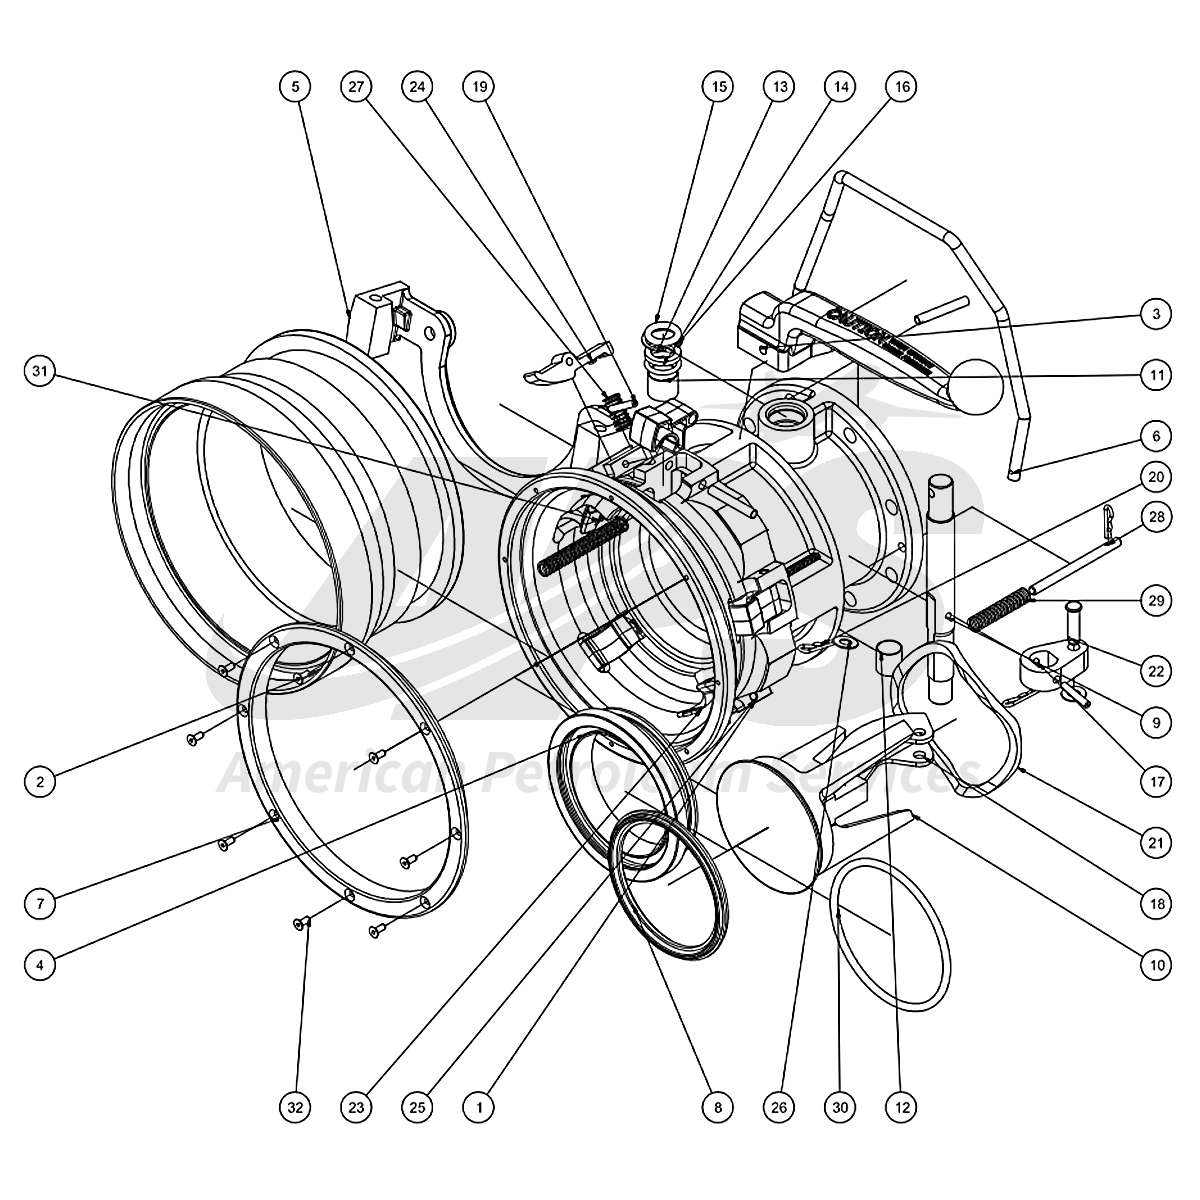 Kit Overhaul J451